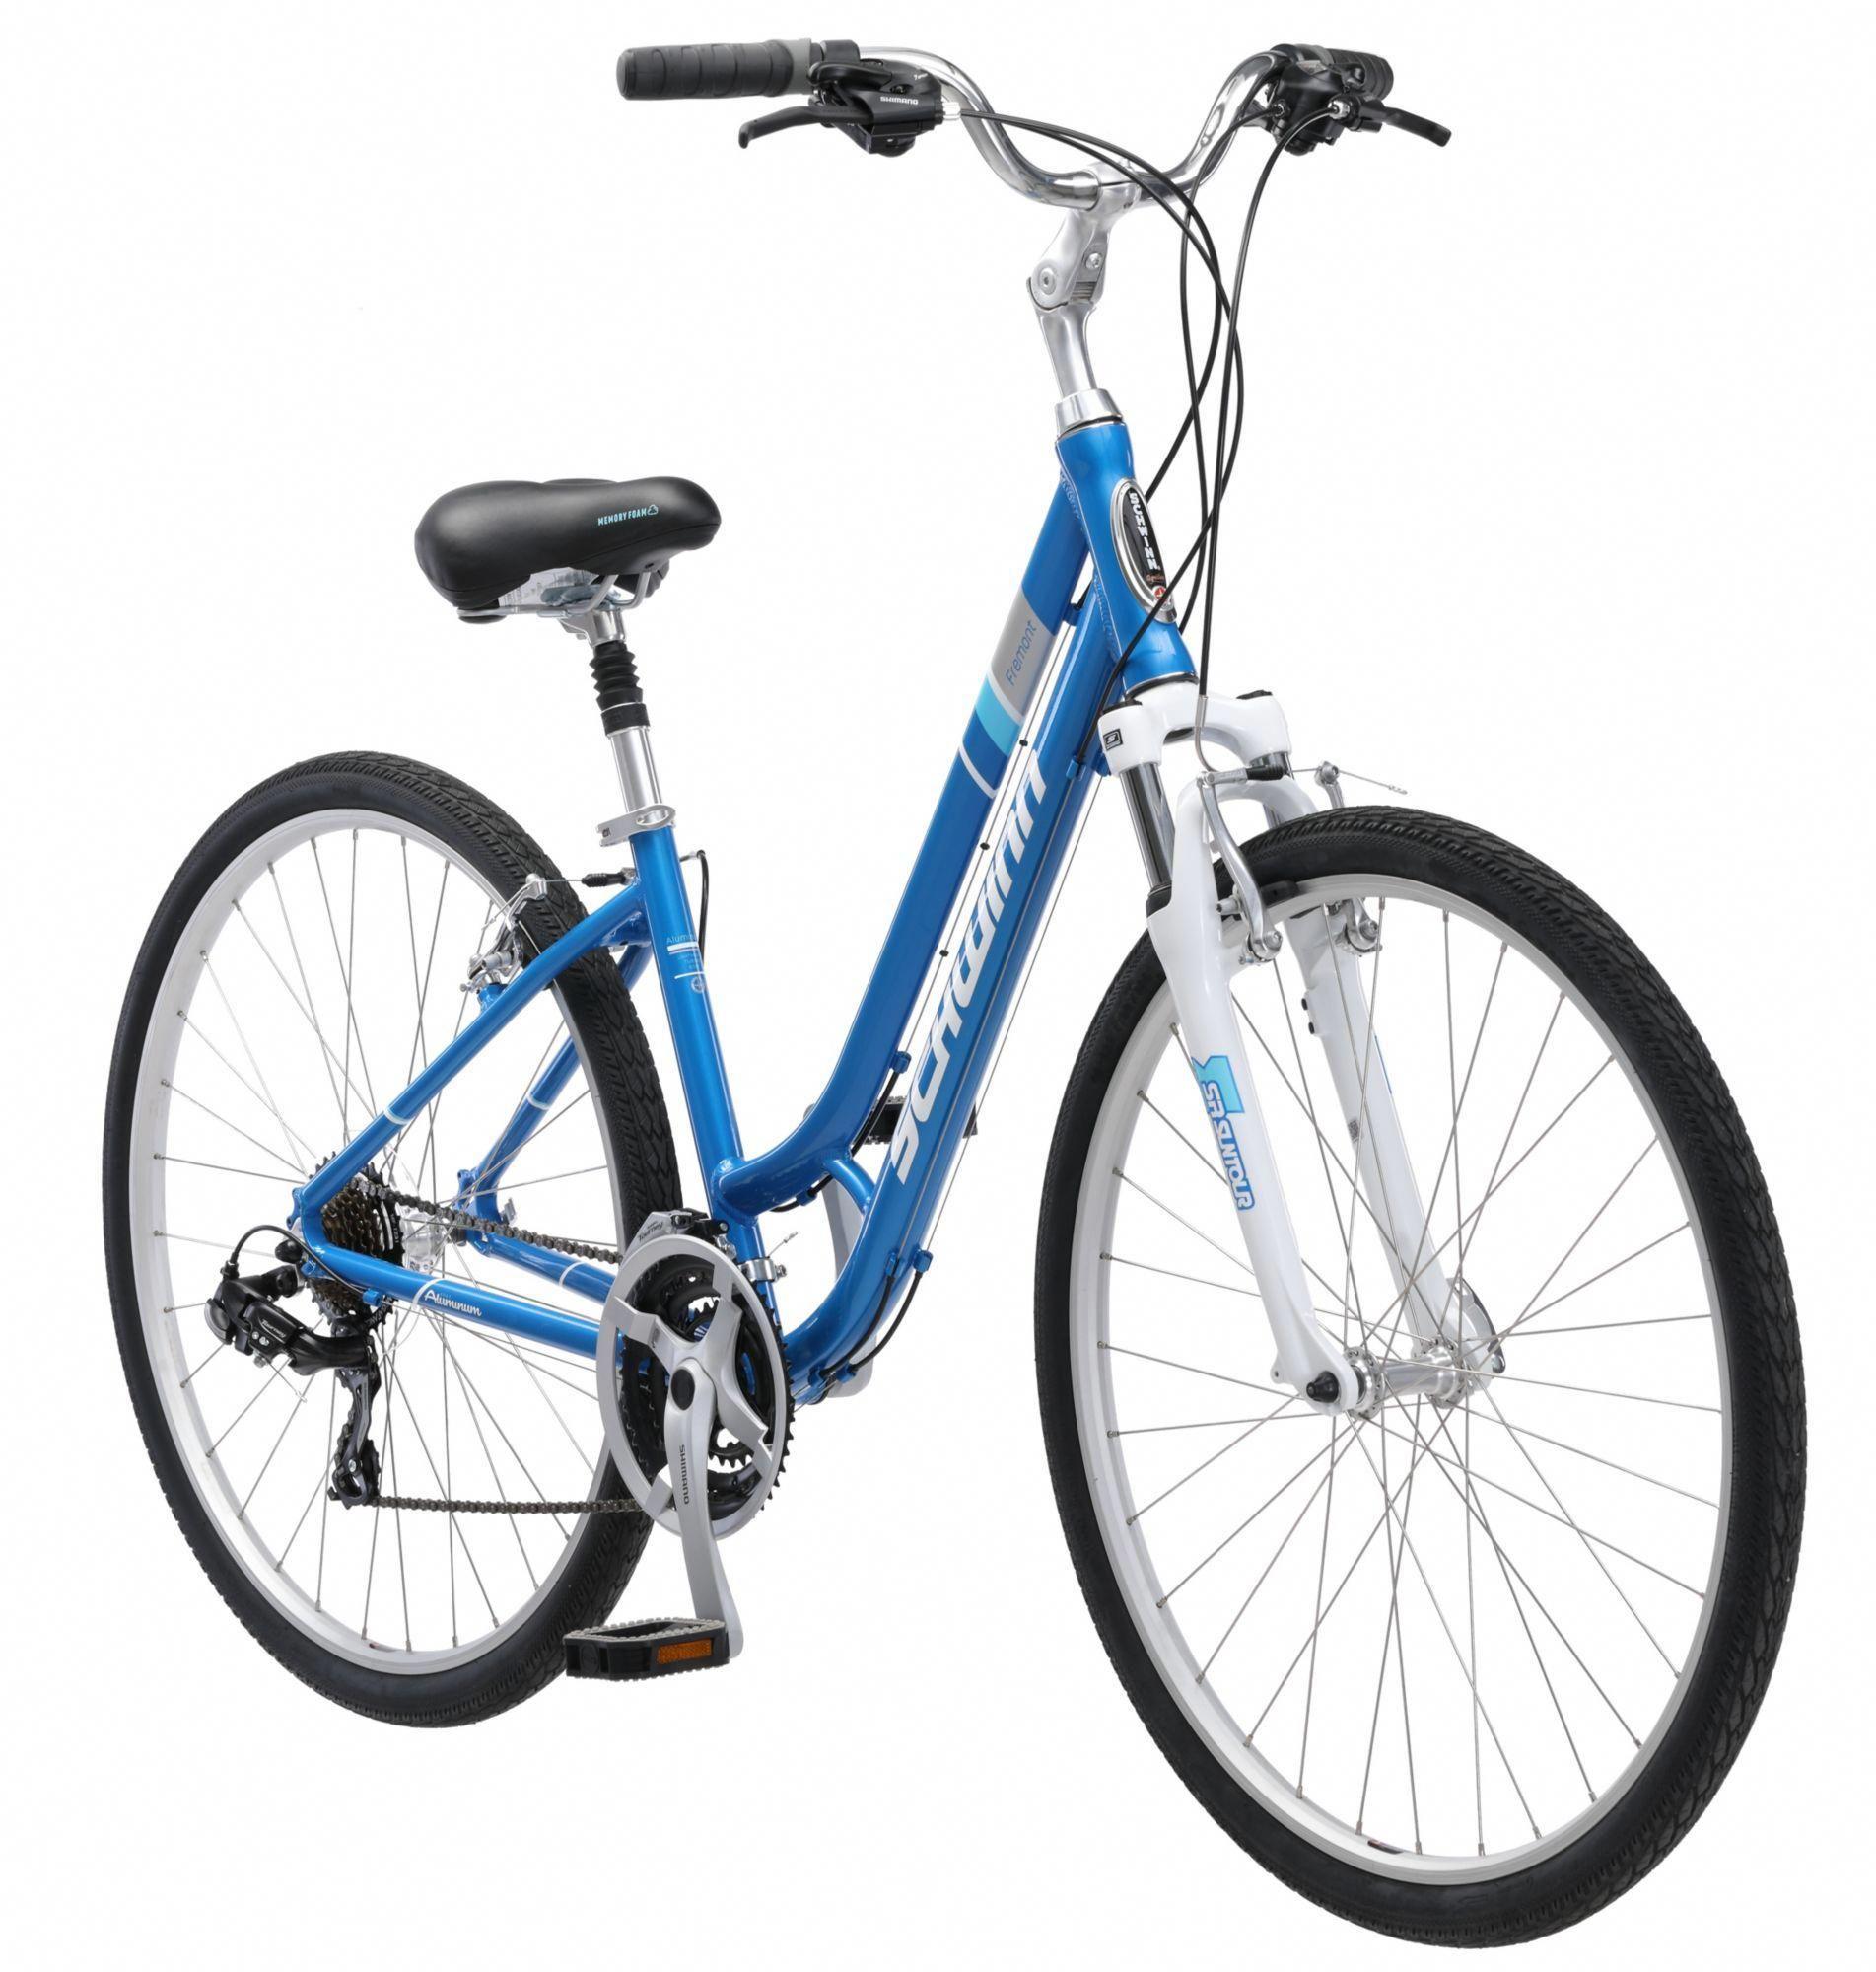 Bicycle Maintenance Hybrid Bike Bicycle Maintenance Schwinn